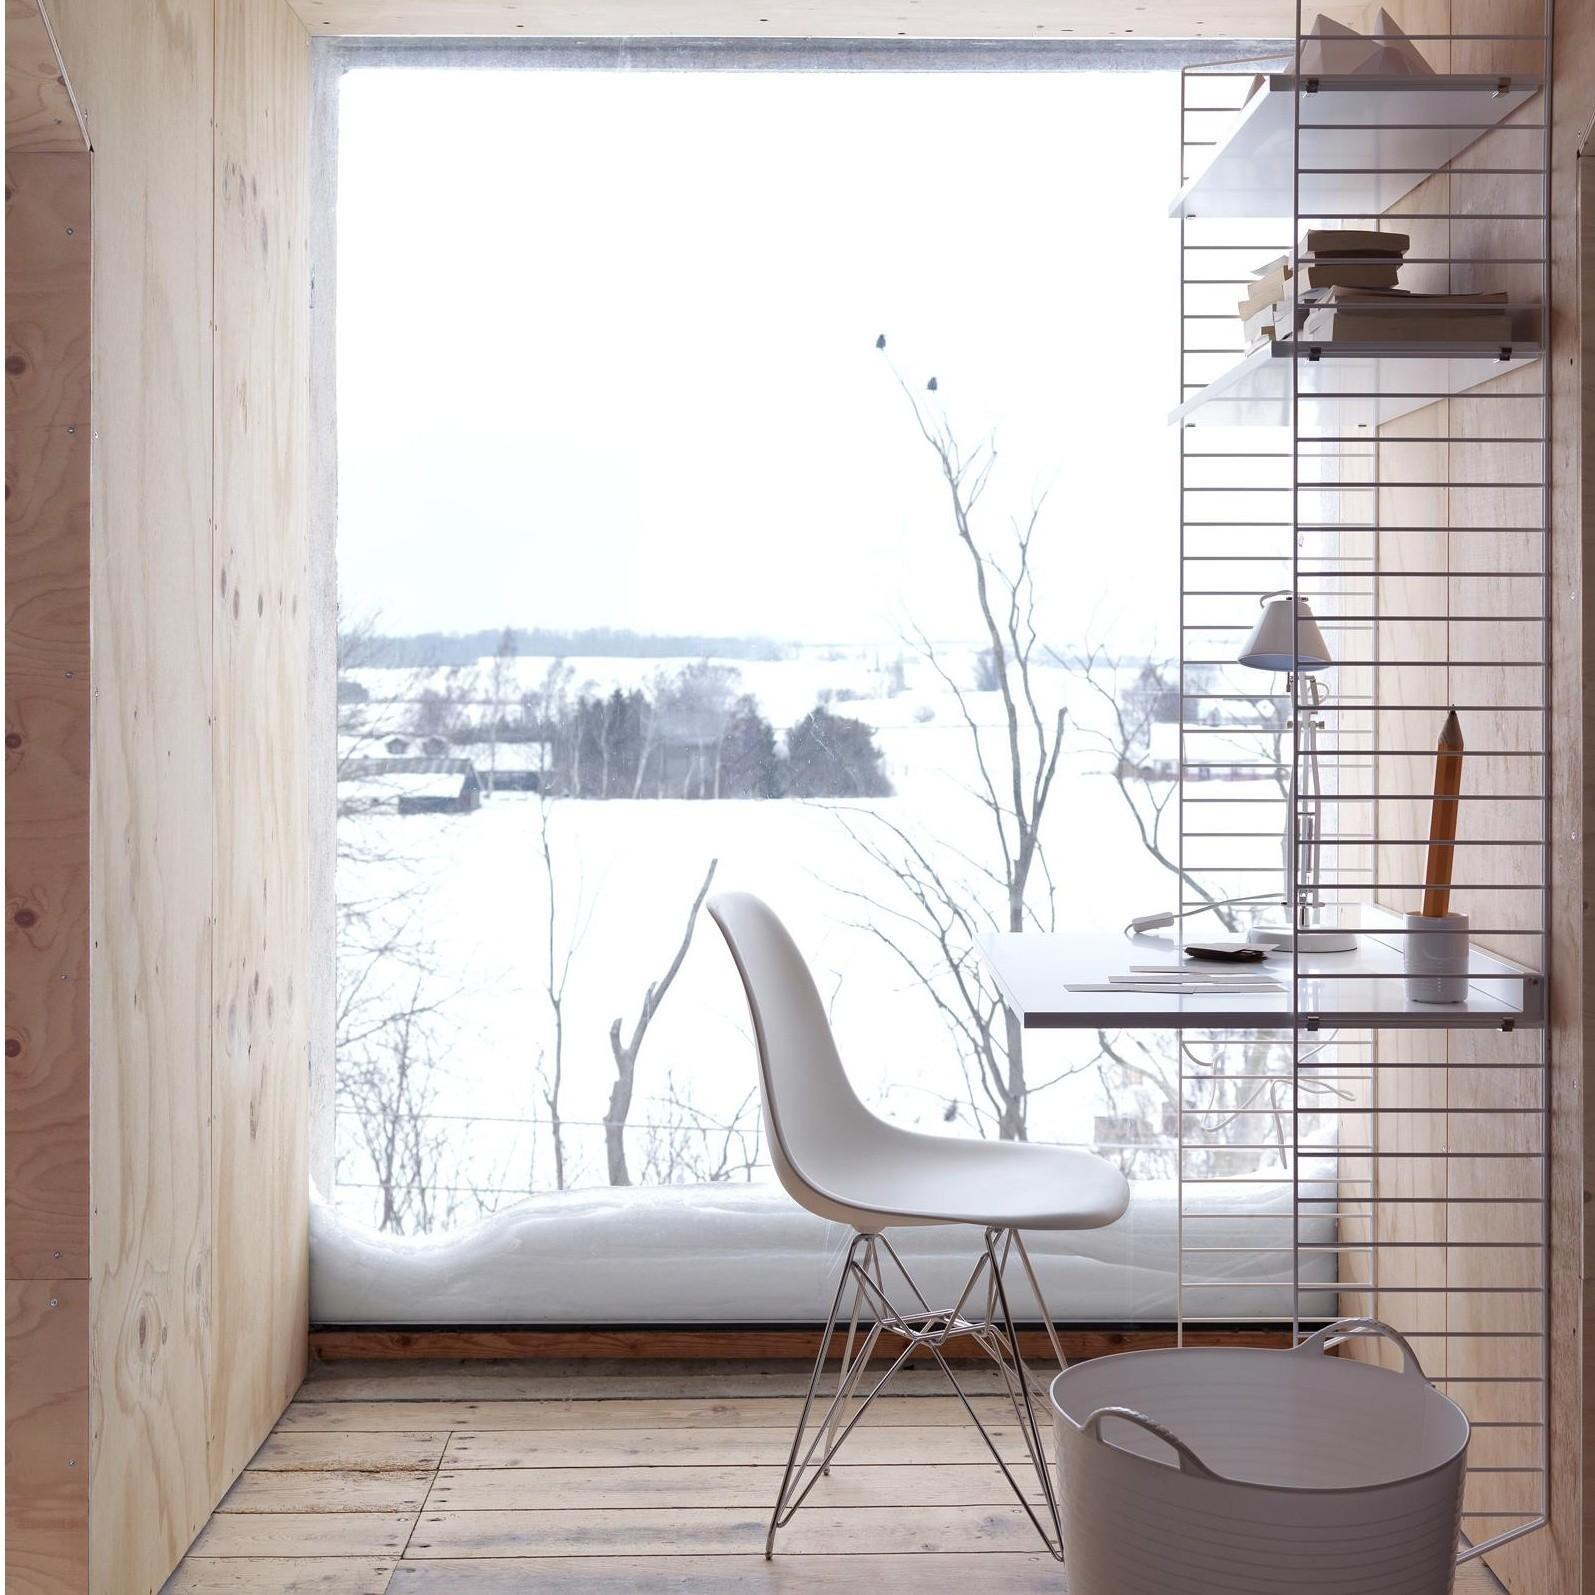 shelf riiul kirjutuslaud desk